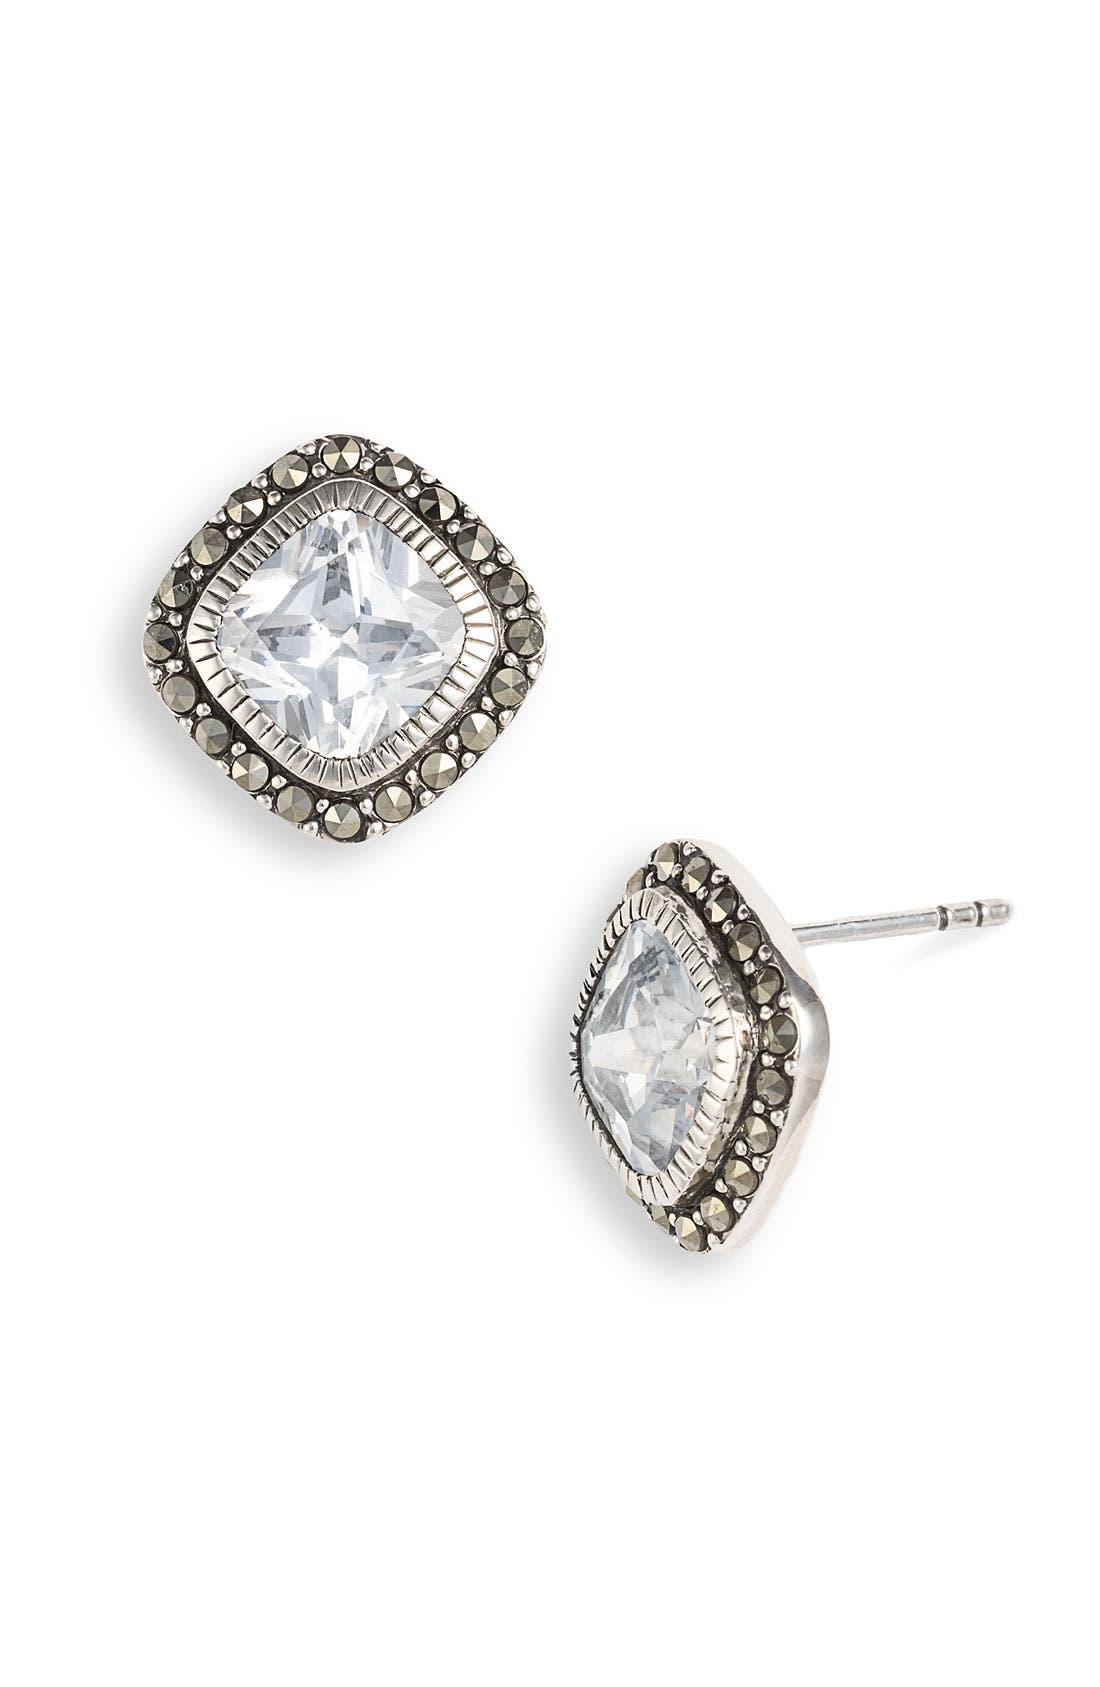 Alternate Image 1 Selected - Judith Jack 'Aquarius' Button Stud Earrings